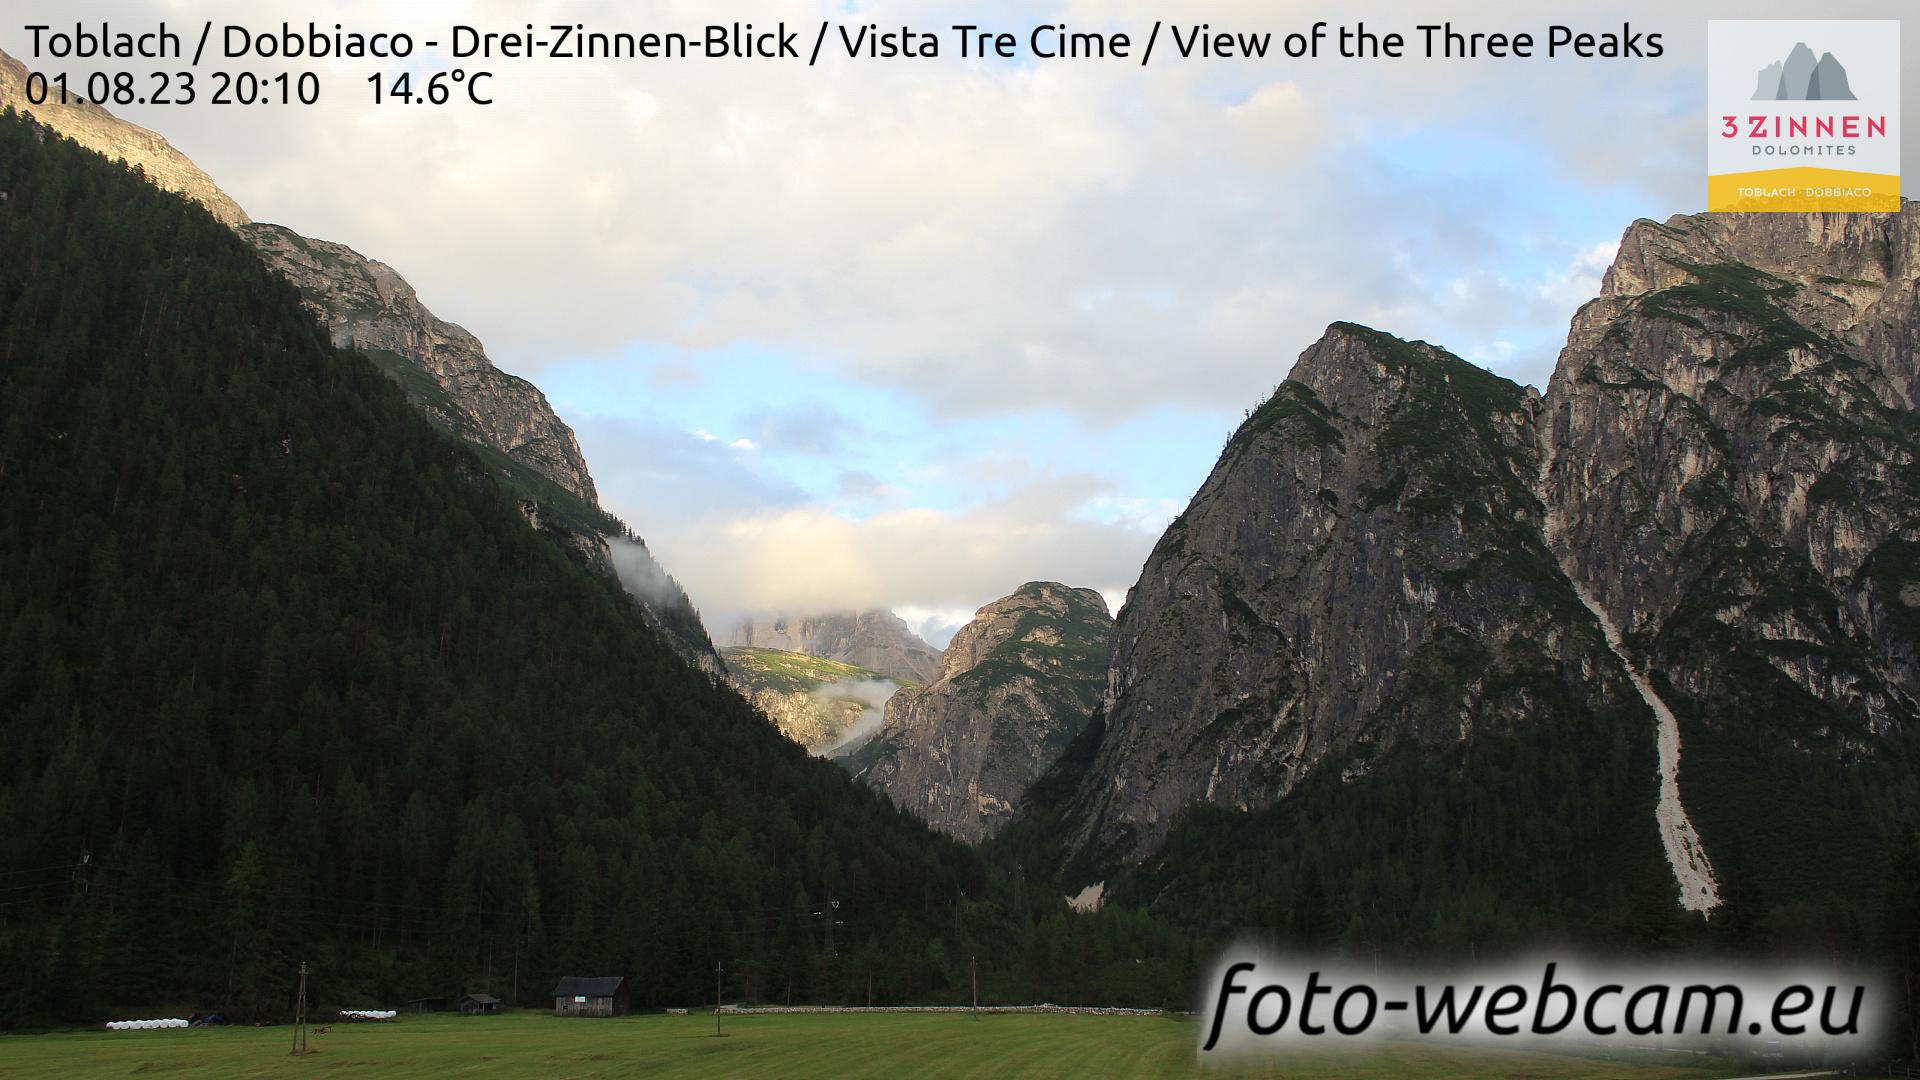 Toblach (Dolomiten) Do. 20:27